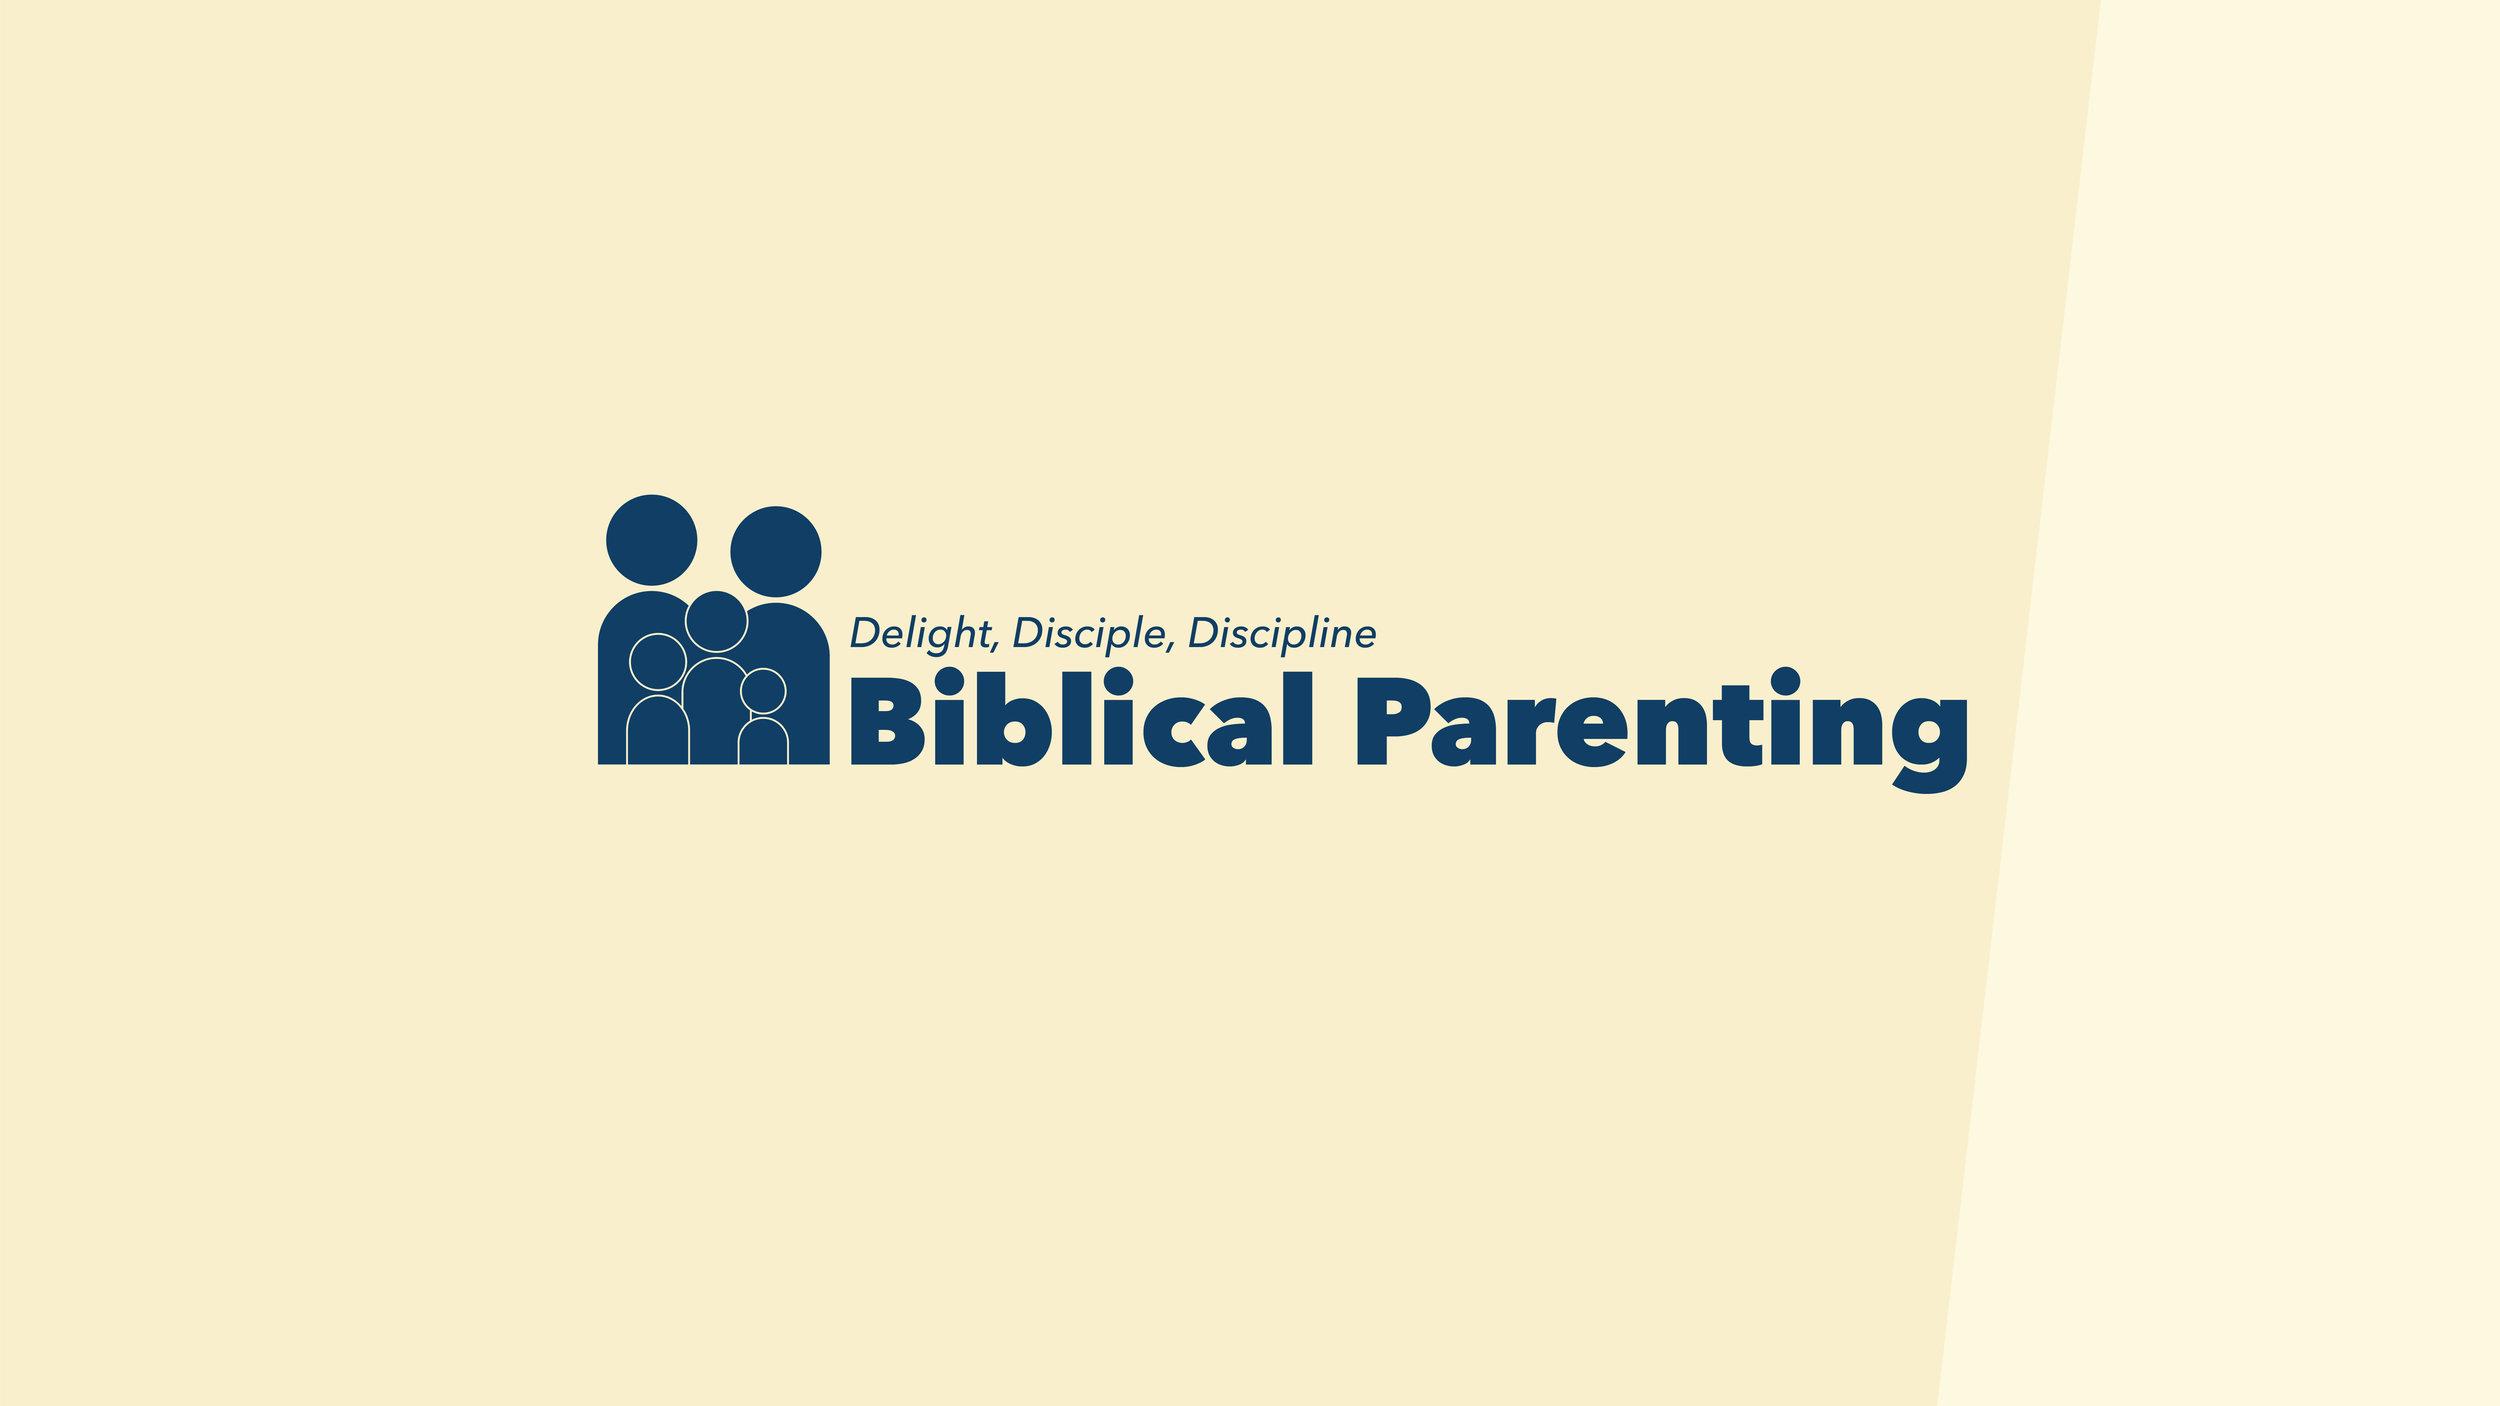 Biblical Parenting - Delight, Disciple, Discipline